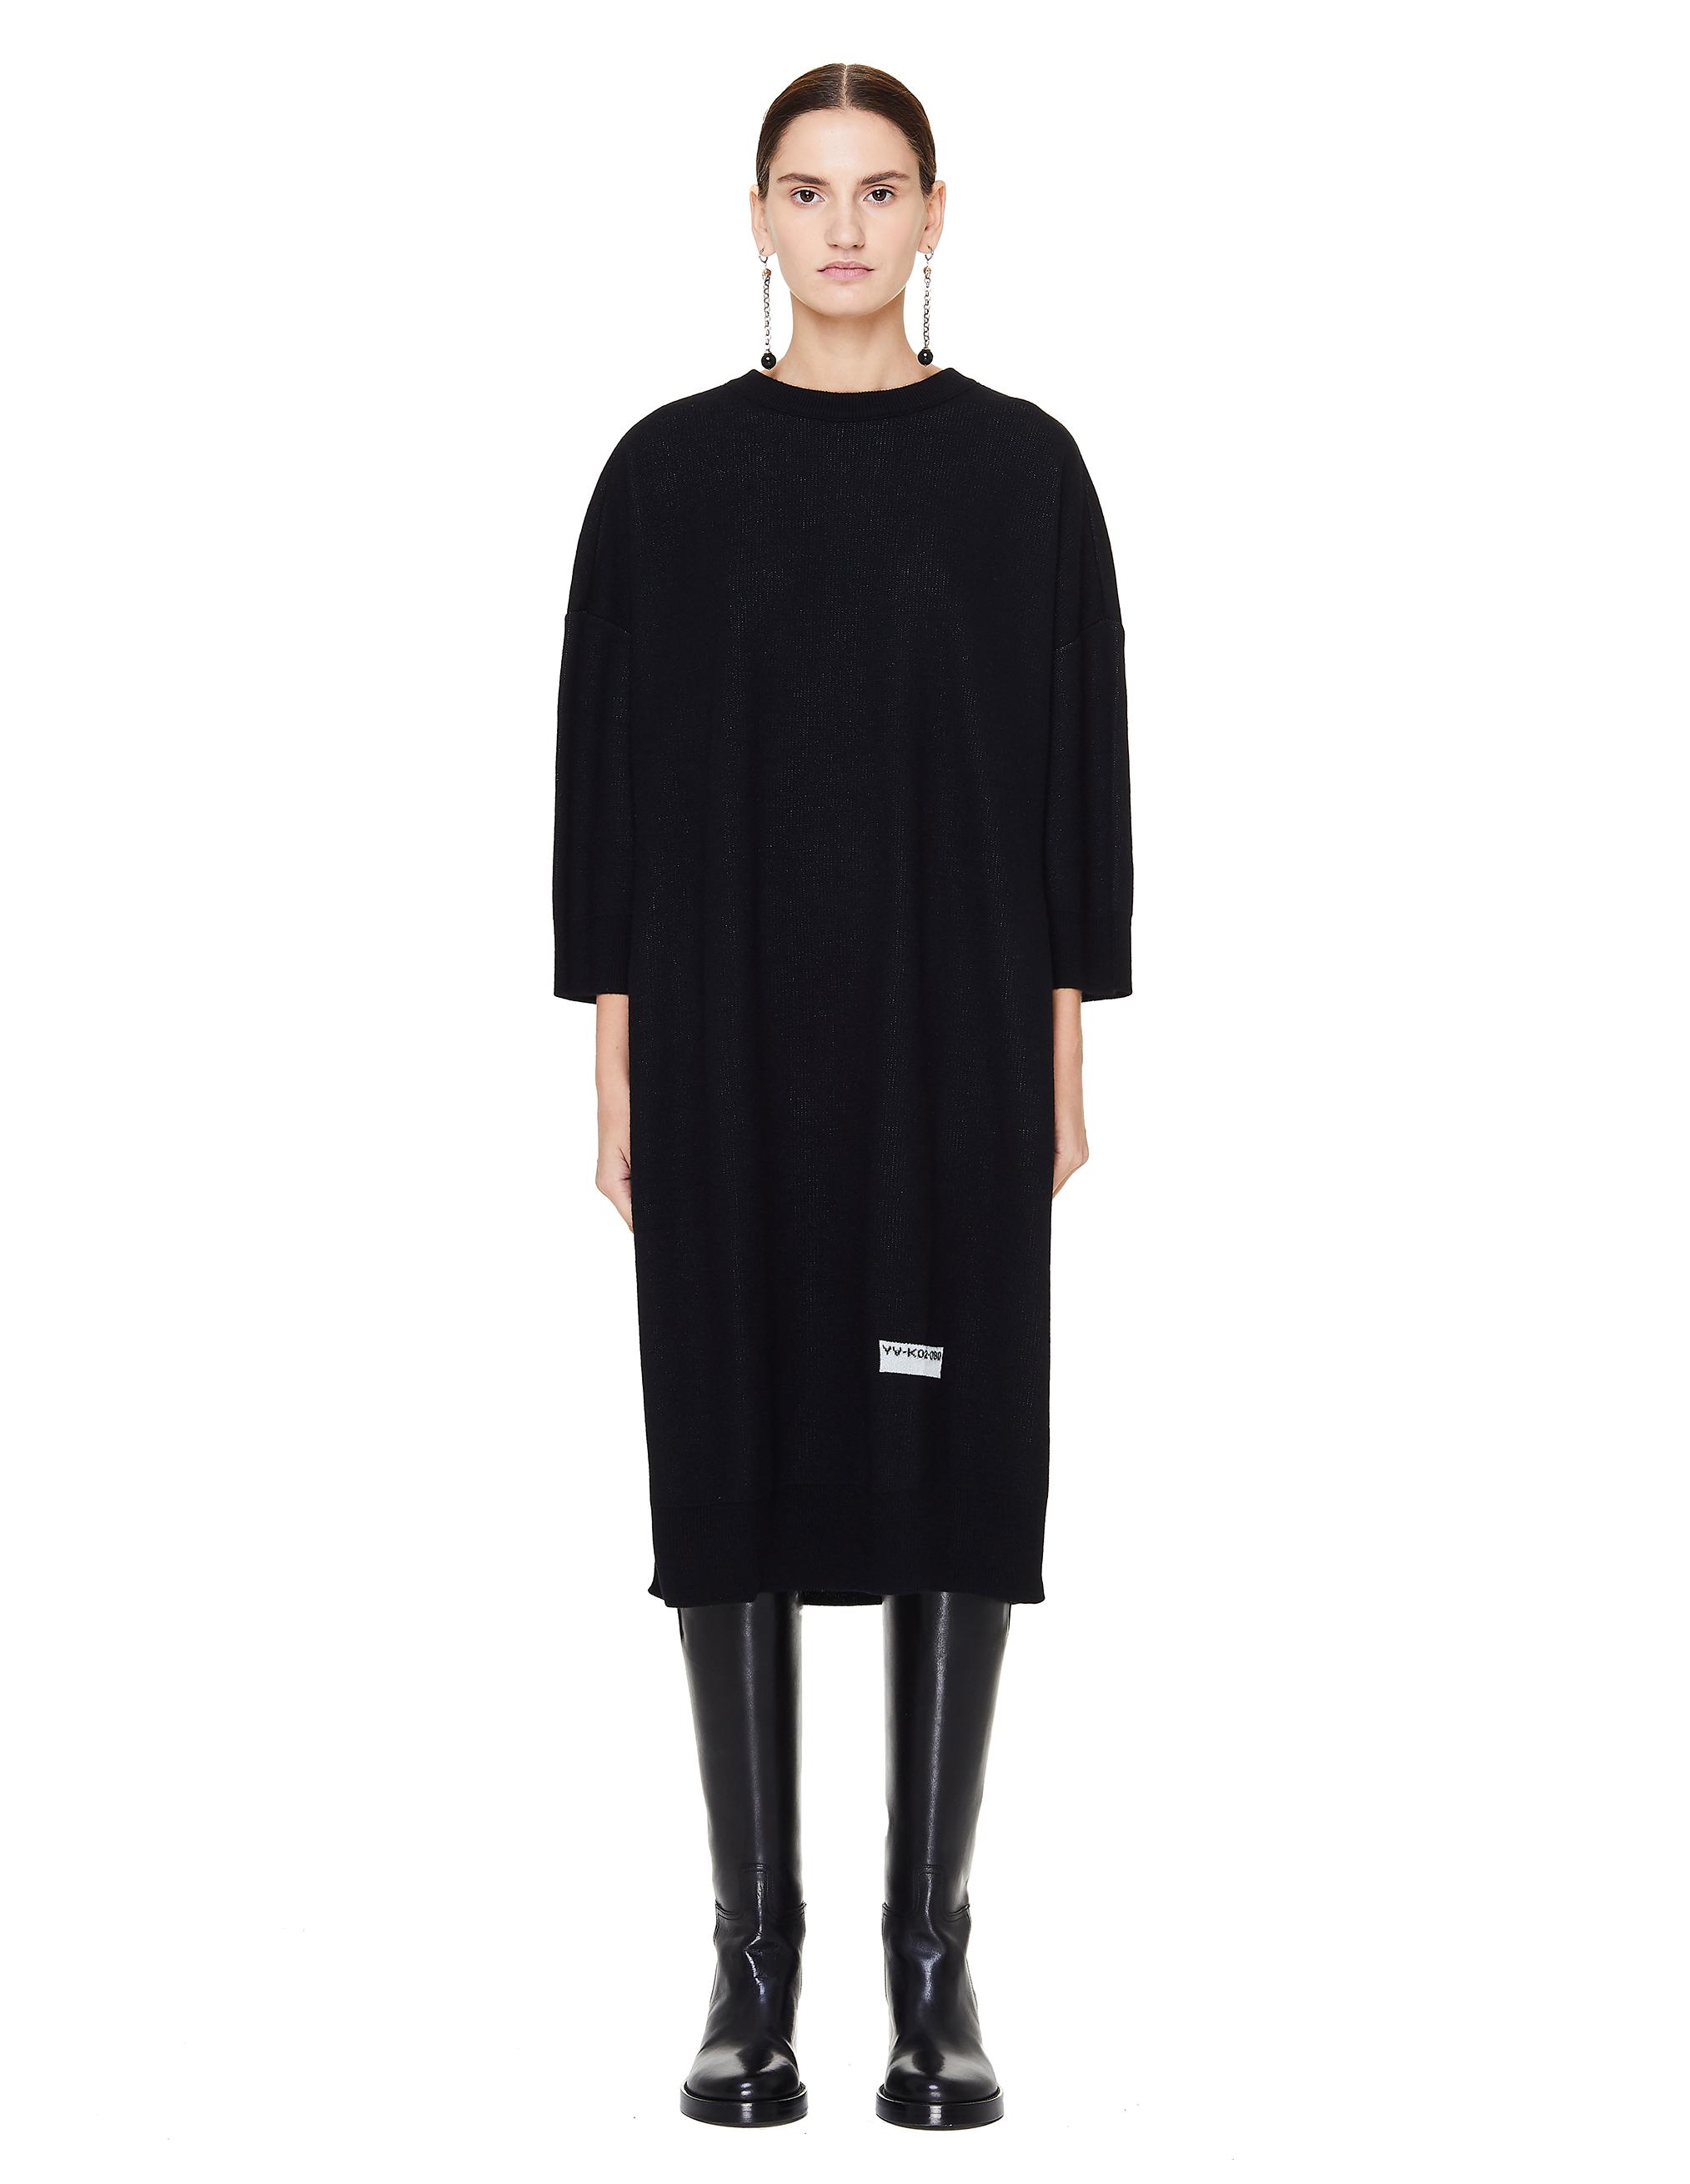 0ee35dcd4ff0cf0 Черное шерстяное платье-свитер Y's Yohji Yamamoto YV-K02-080/blk ...